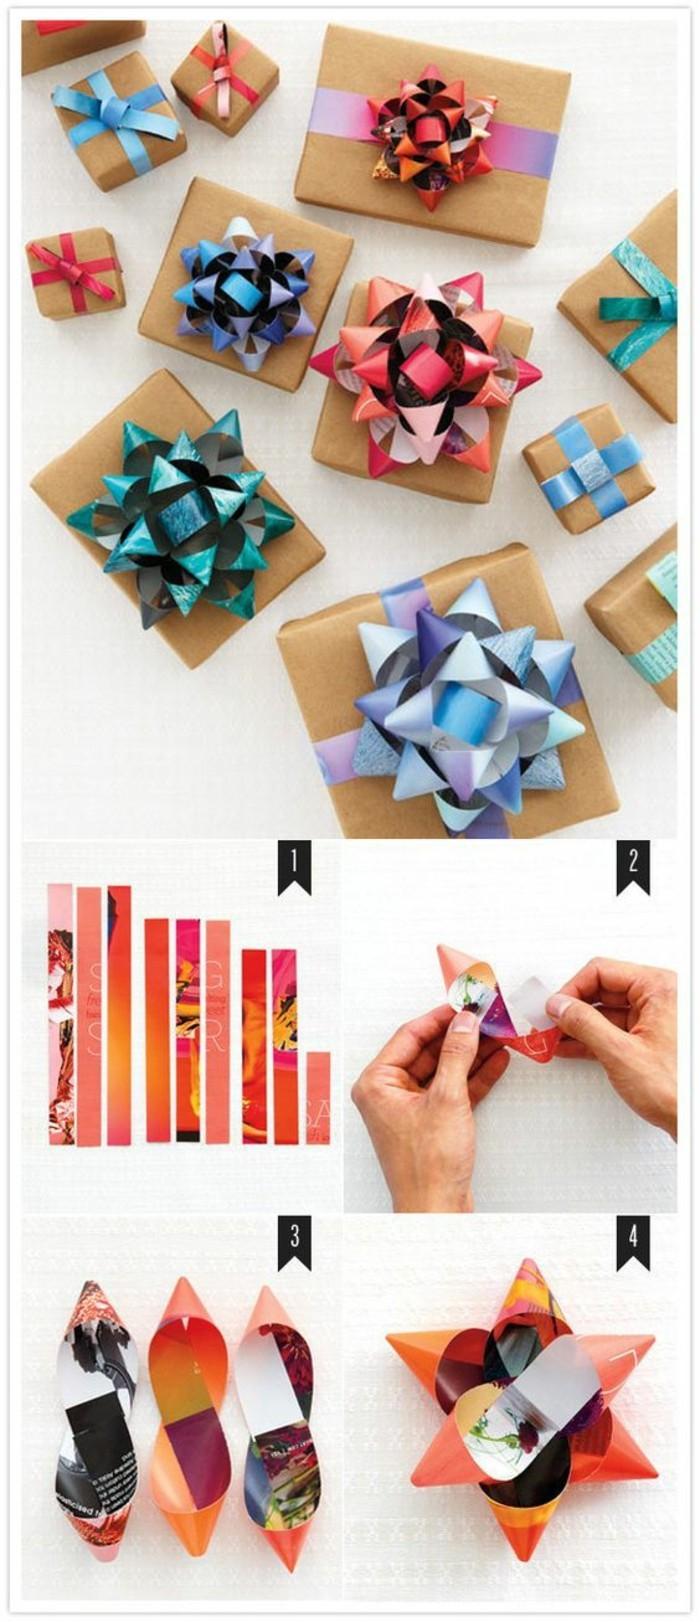 kreative-geschenkideen-geburtstagsgeschenkideen-geschenk-originell-verpacken